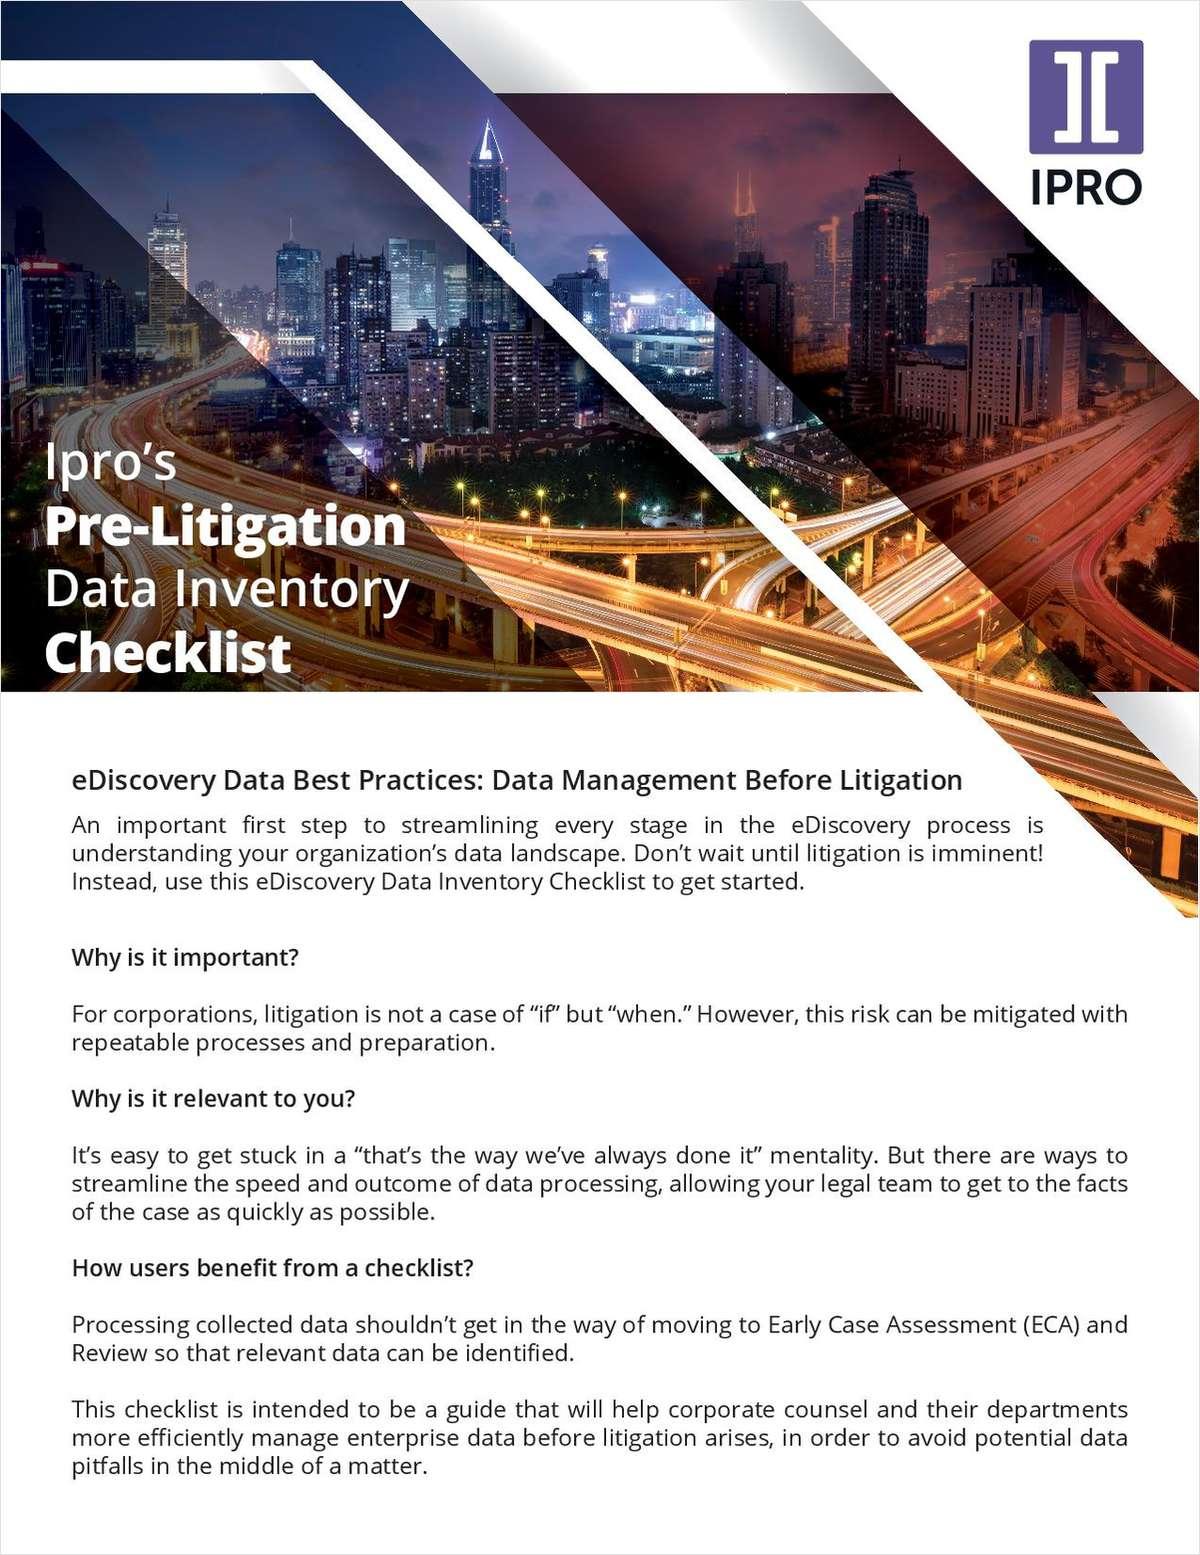 Pre-Litigation Data Inventory Checklist